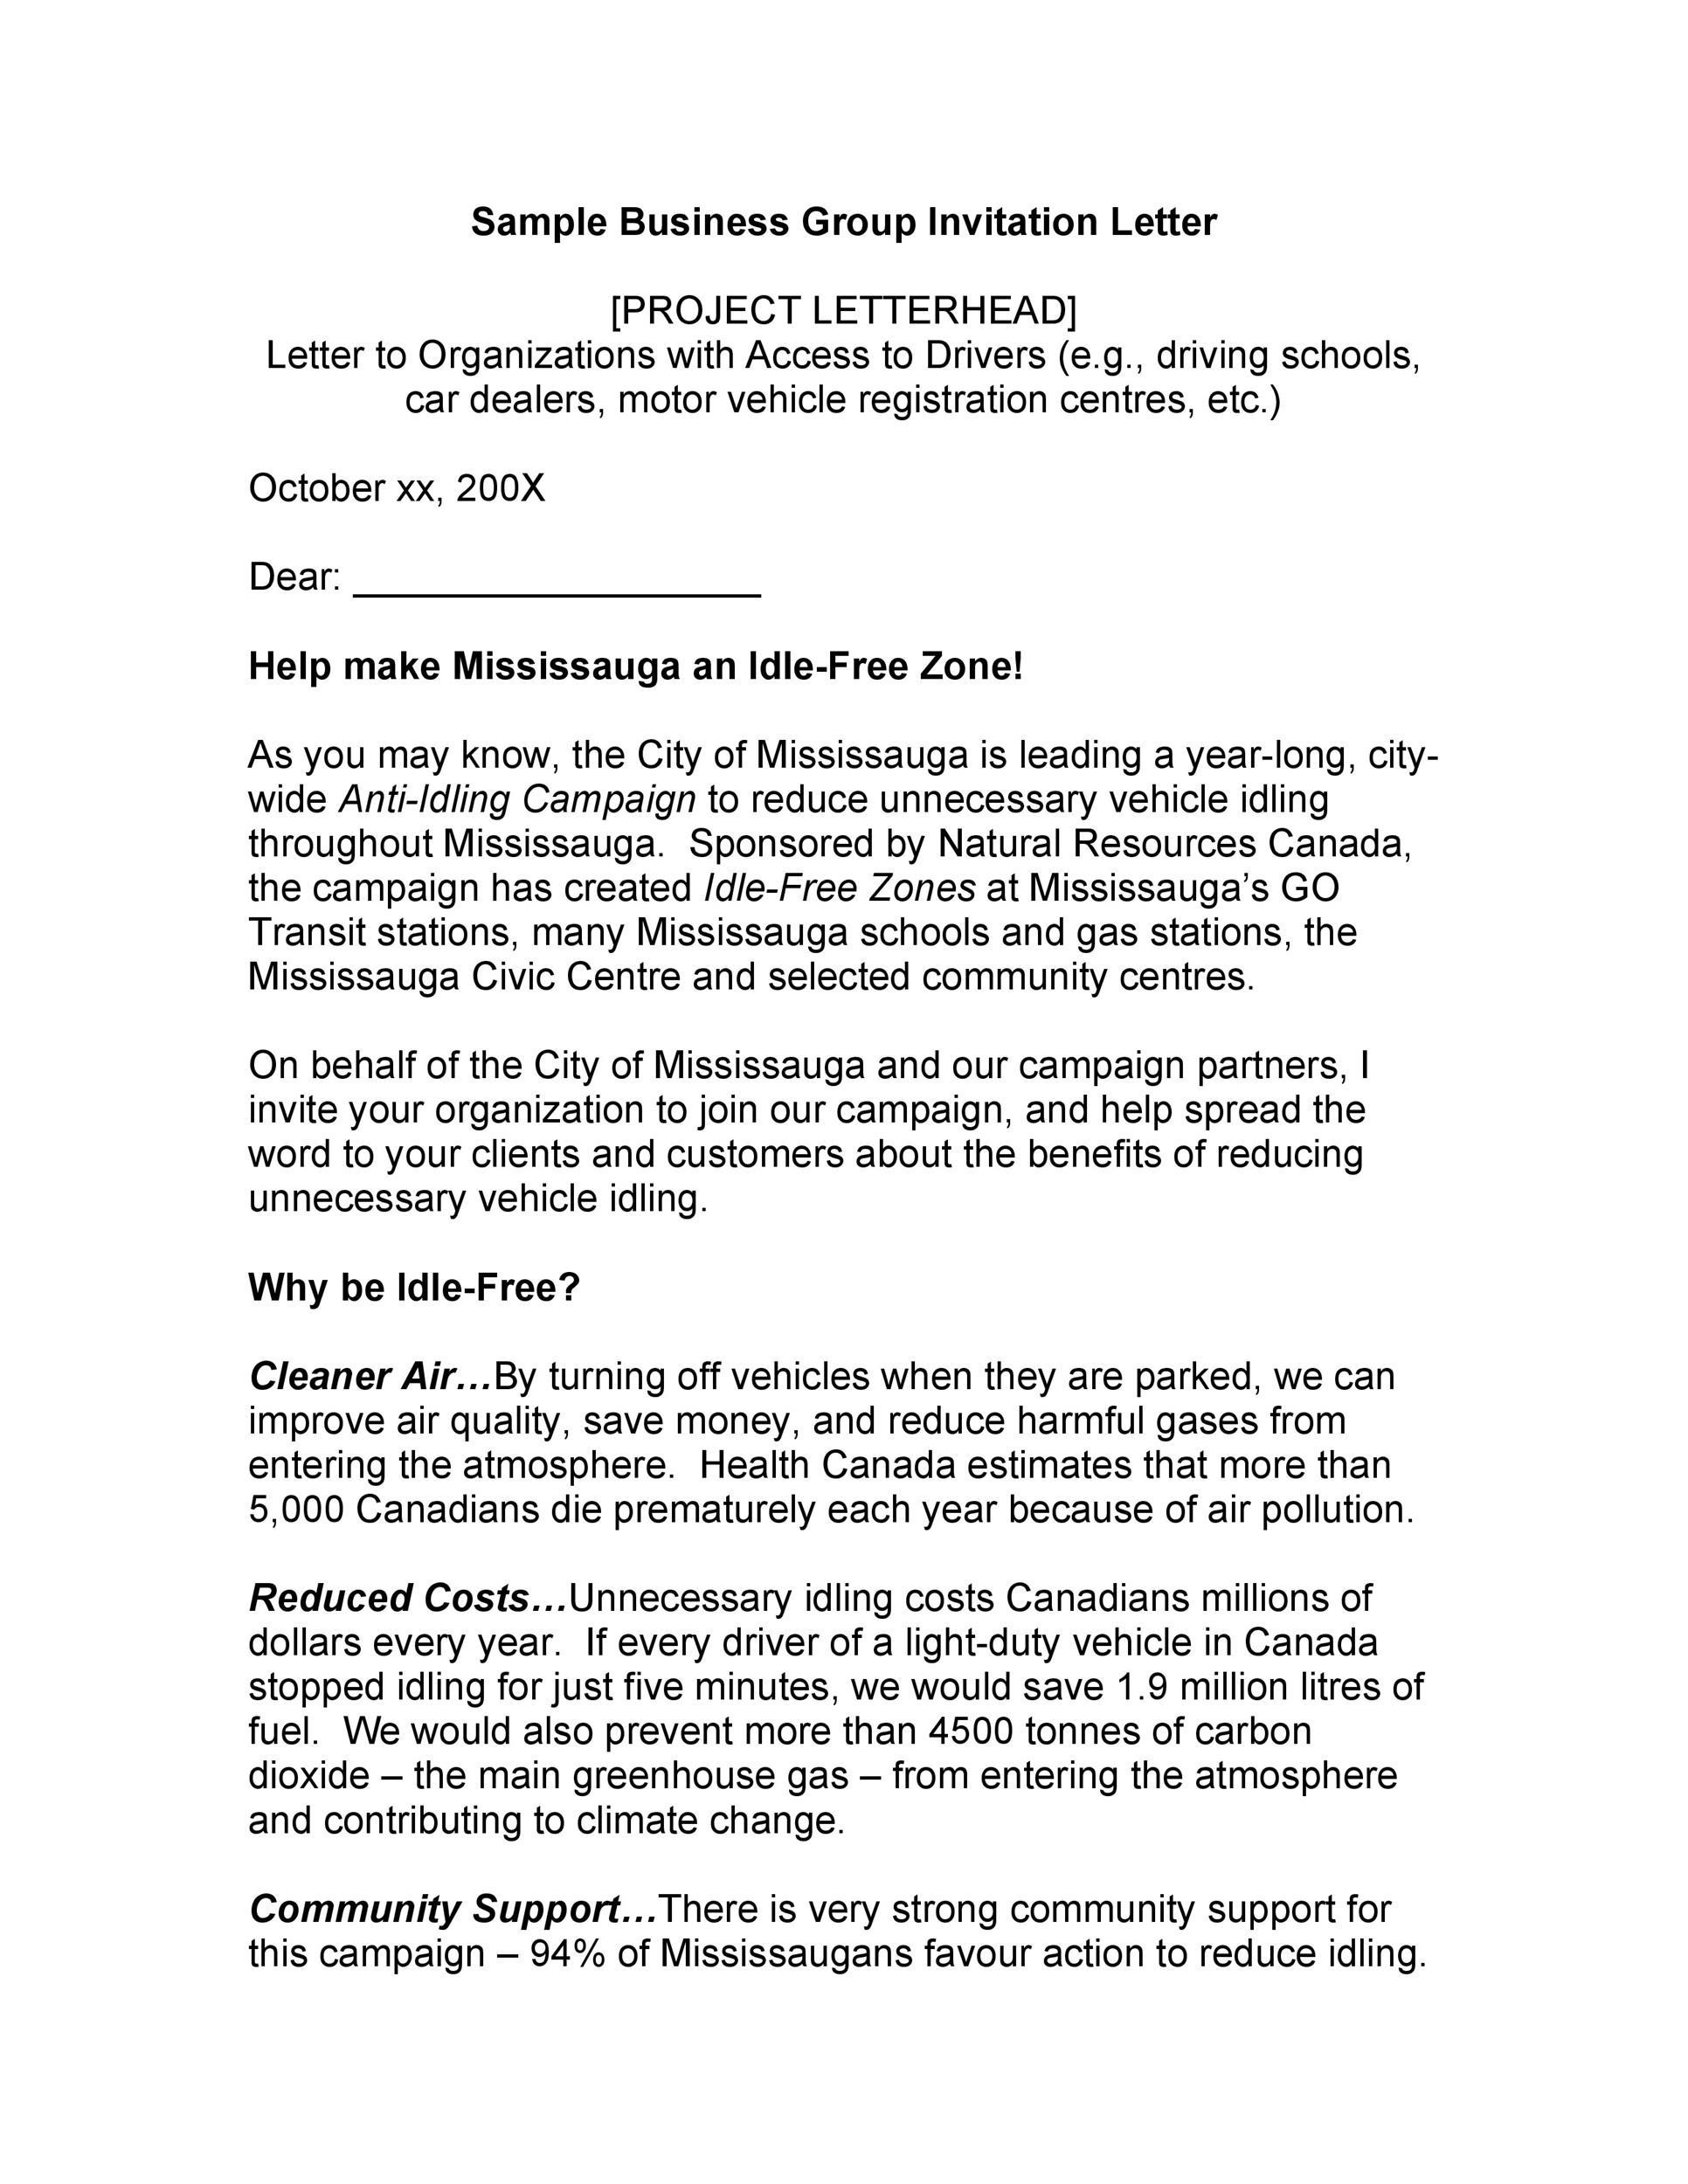 Free invitation letter 24